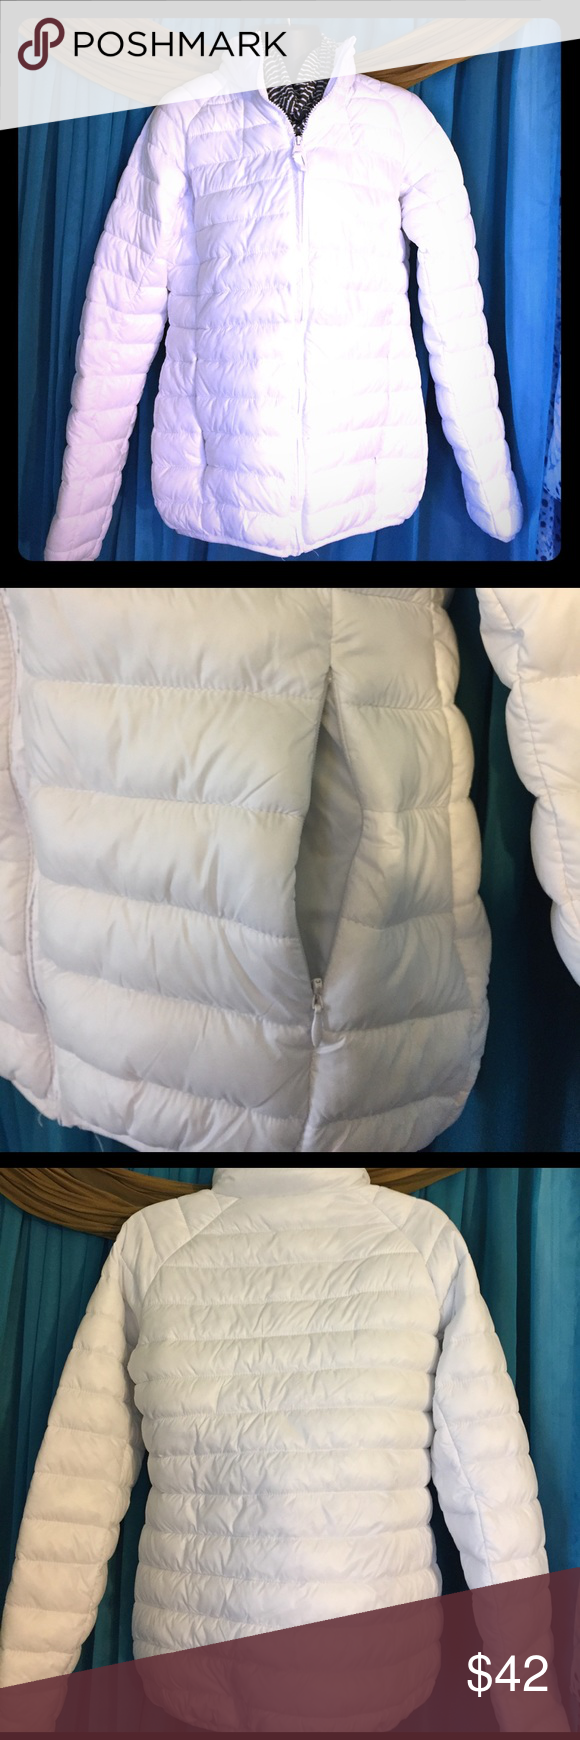 Jackson Hole Lightweight Puffer Jacket Nwot Sizem White Puffer Jacket Jackets Clothes Design [ 1740 x 580 Pixel ]